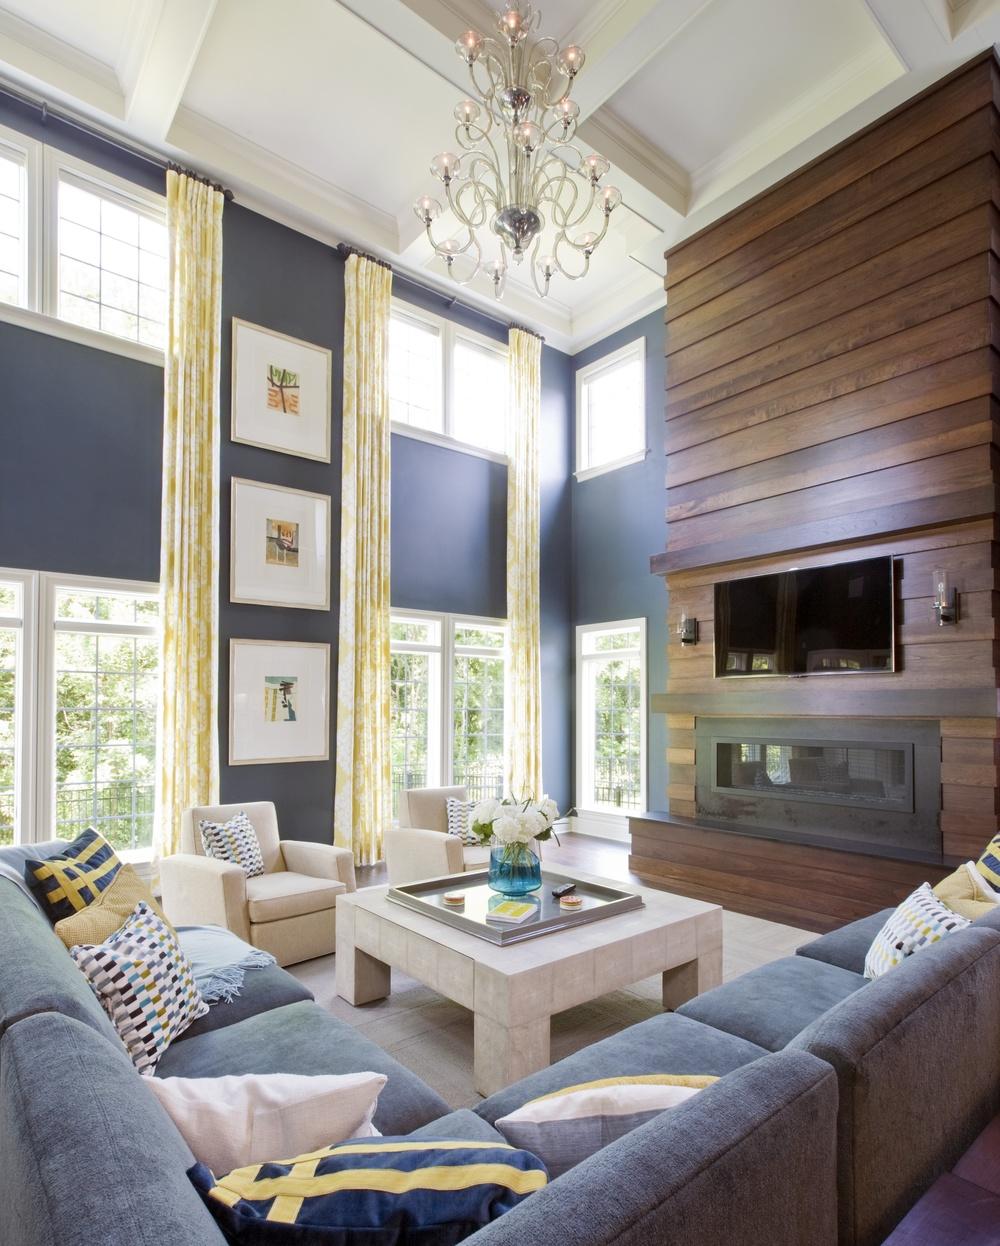 Design The Home Of Your Dreams: Dream House Studios, Inc